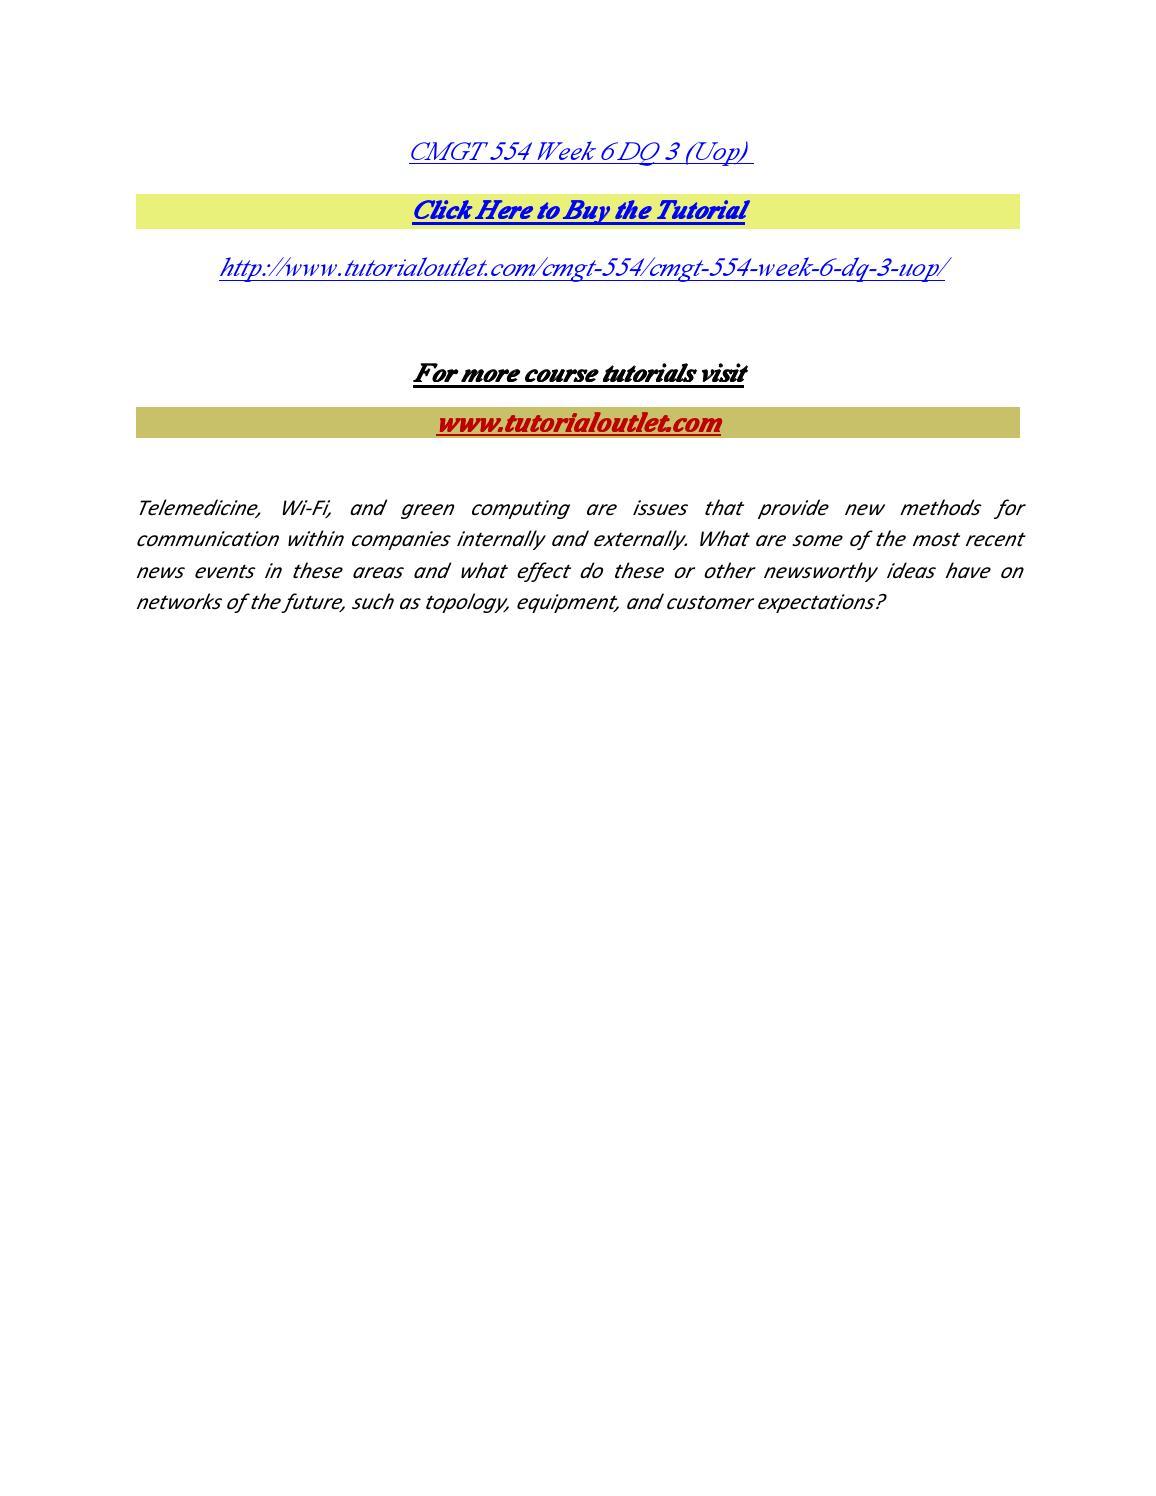 CMGT 554 WEEK 4 Individual: International Plastics, Inc. Organizational Systems Management Plan